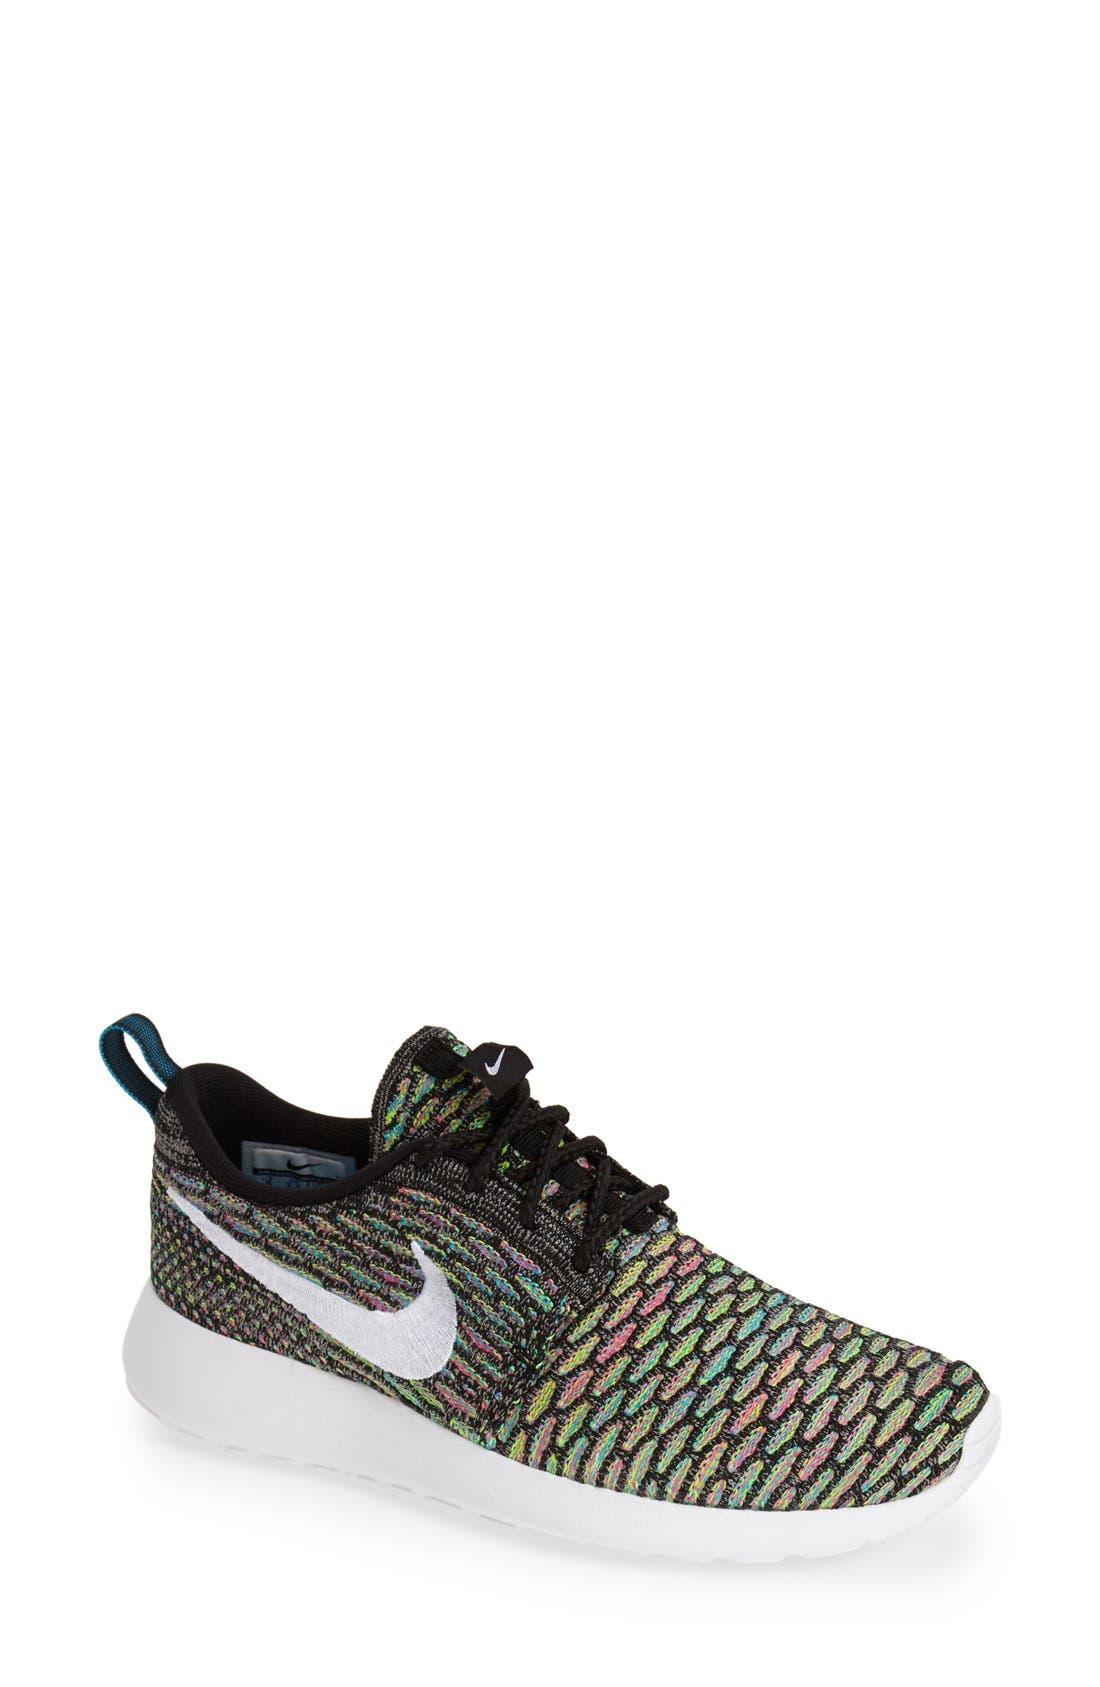 0e08d824d0 aliexpress cheap kobe 6 shoes 8a3f0 f0d07; promo code flyknit roshe run  sneaker 72959 3cf50